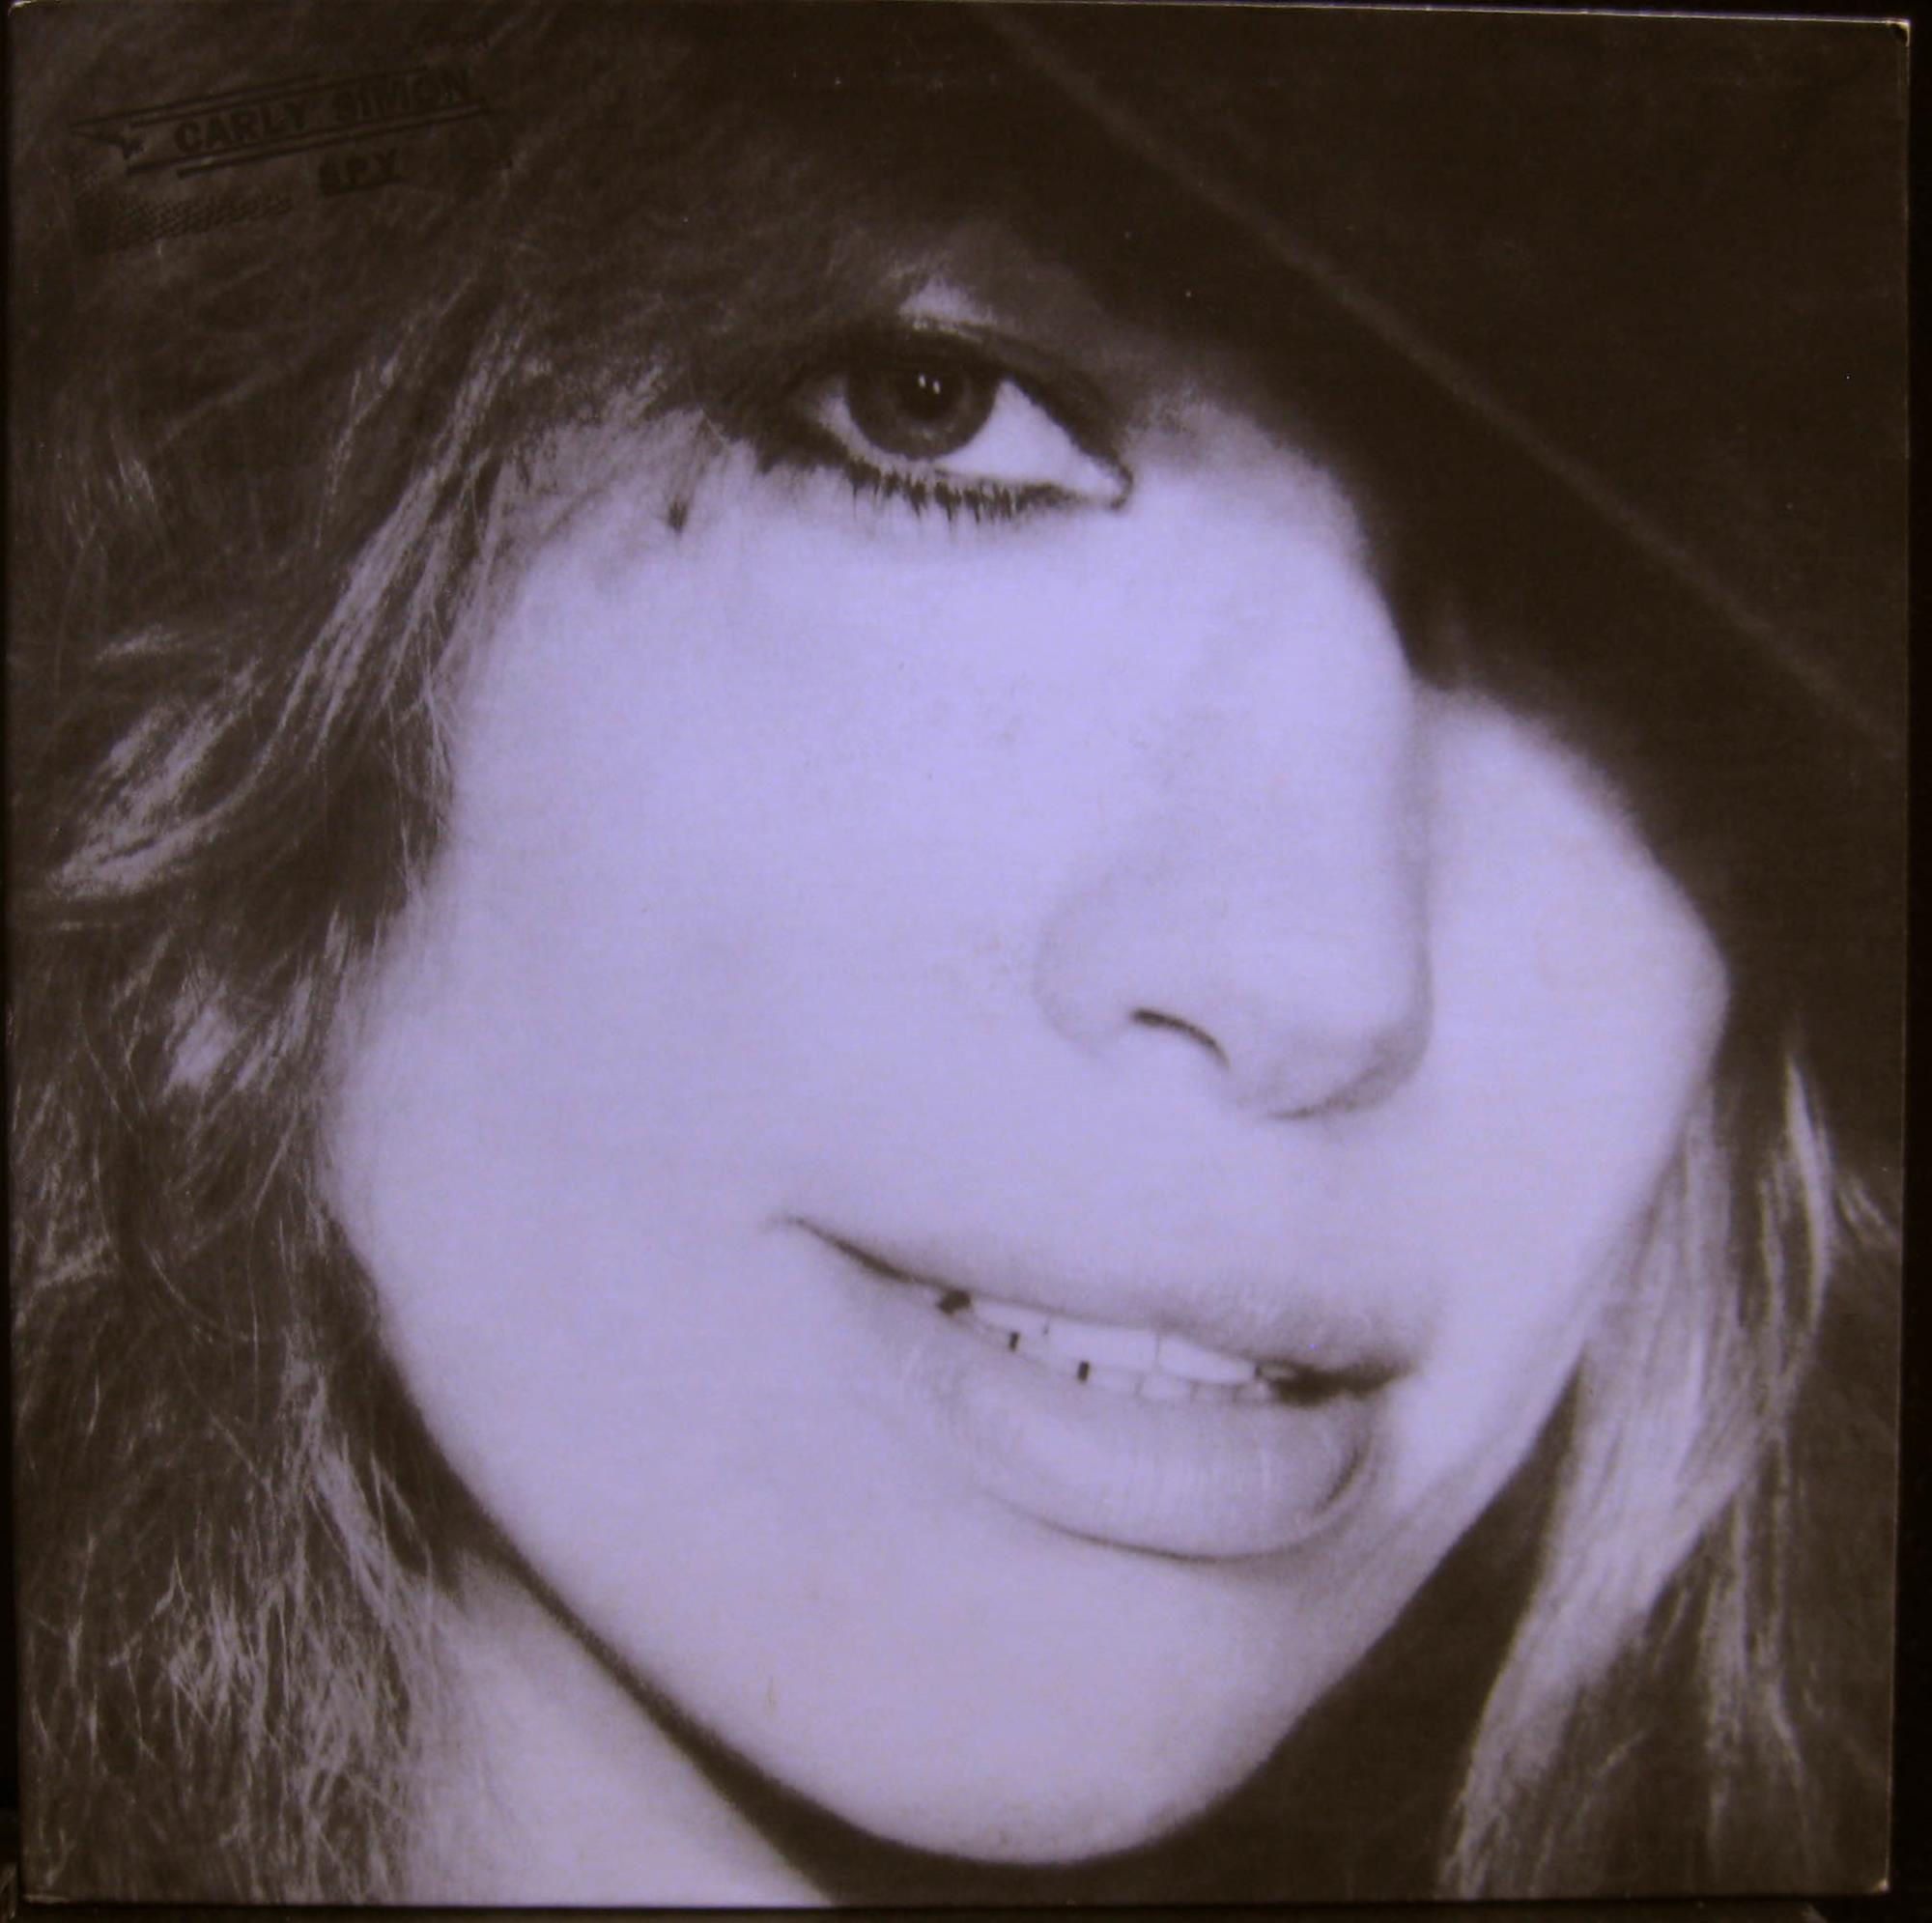 CARLY SIMON - Carly Simon Spy Lp Vg+ 5e 506 Elektra Usa 1979 Original (spy)